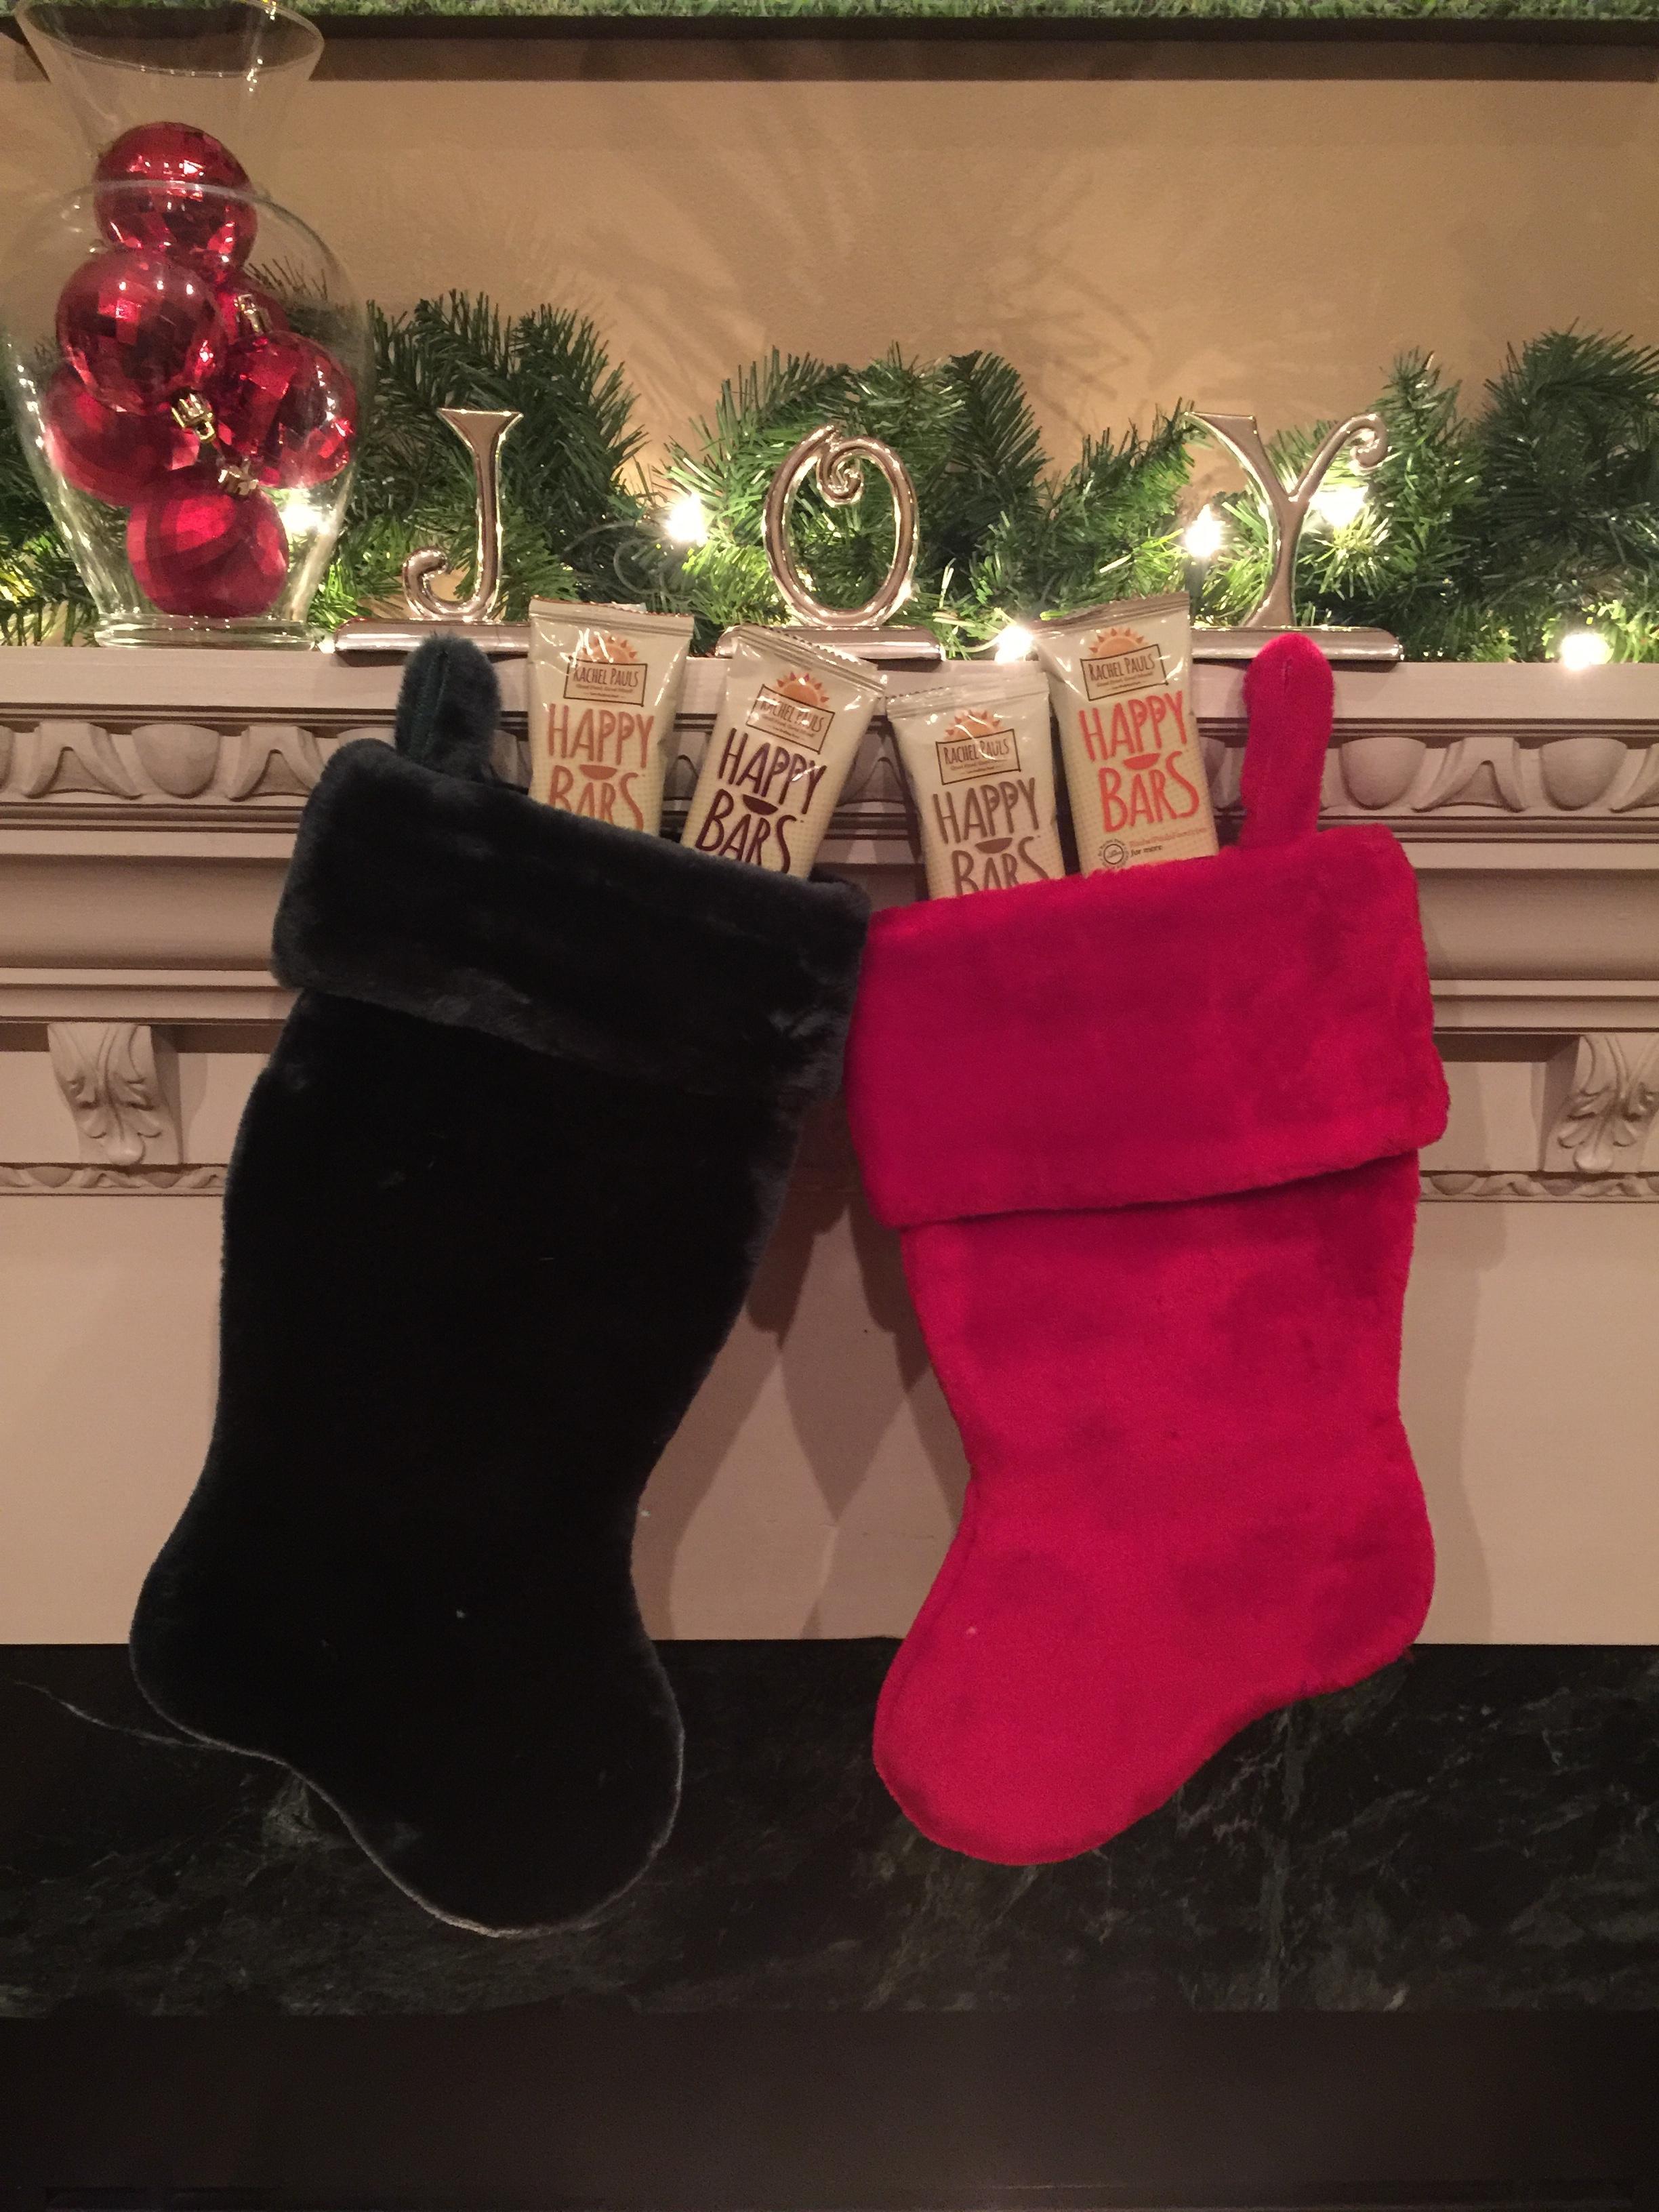 Hanukkah Christmas Stocking.Top 10 Low Fodmap Stocking Stuffers Or Hanukkah Gifts